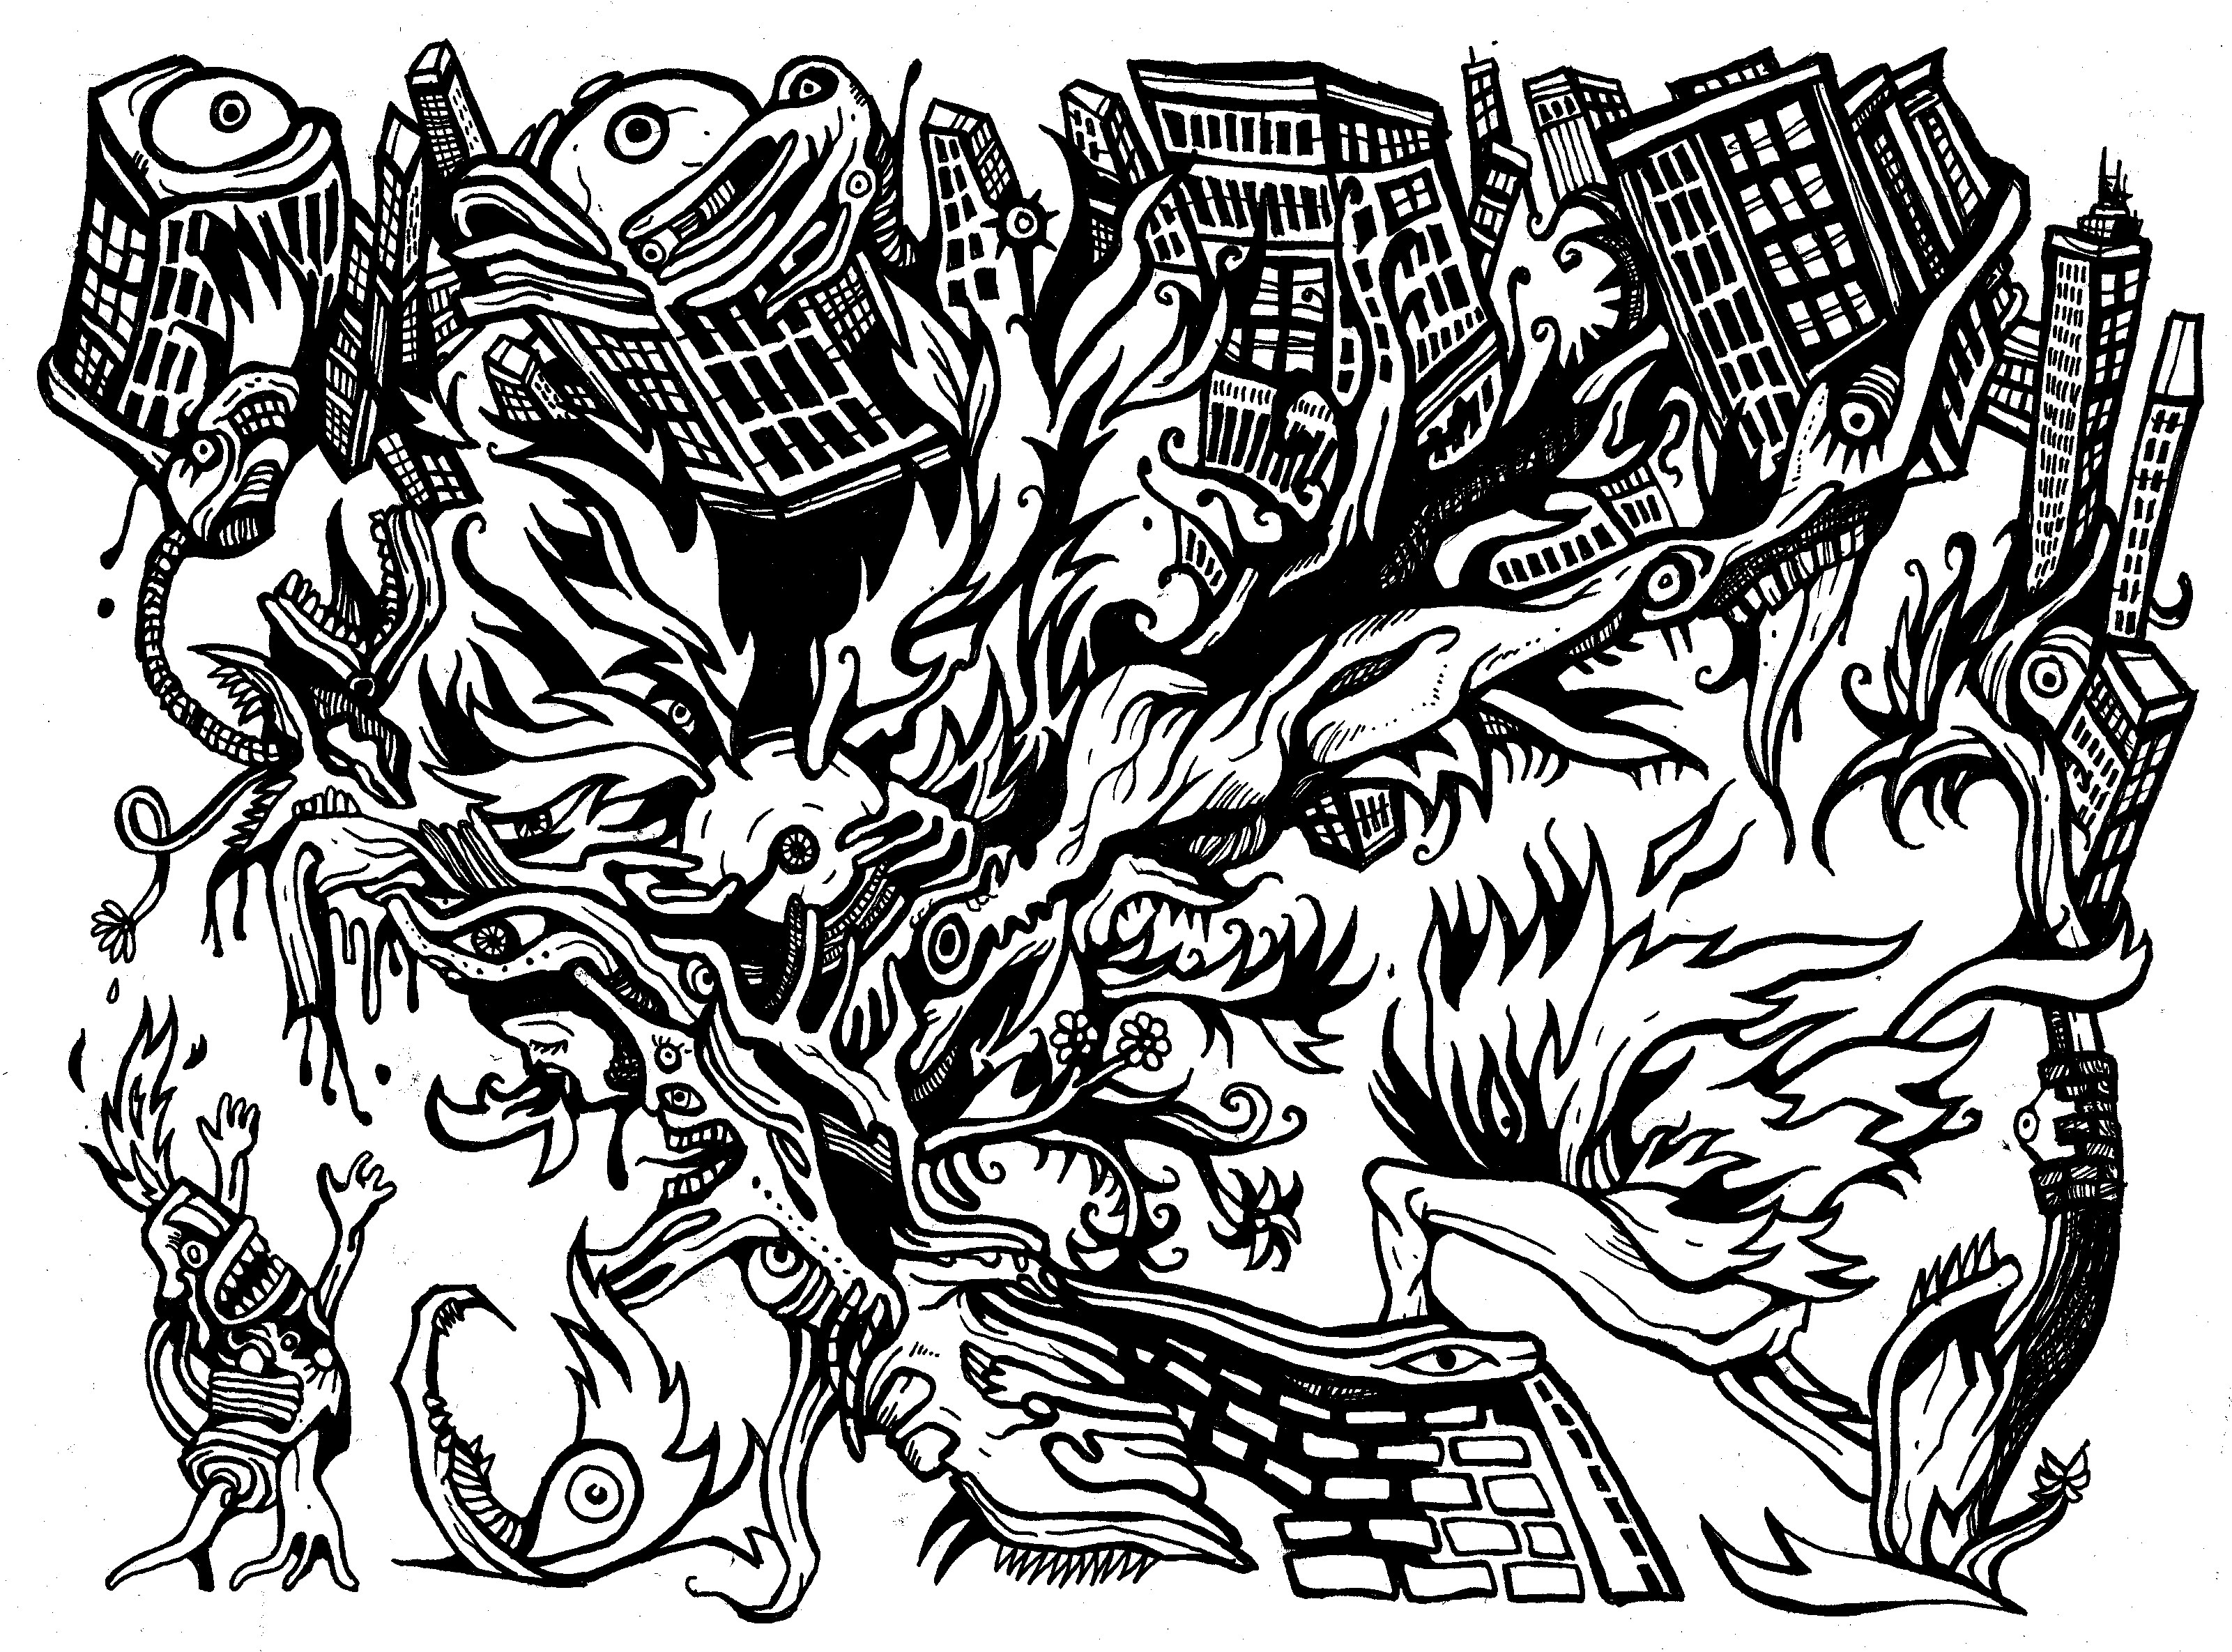 3202x2370 Heat Demons Comic Book Drawings Heyapathy Surreal Comics